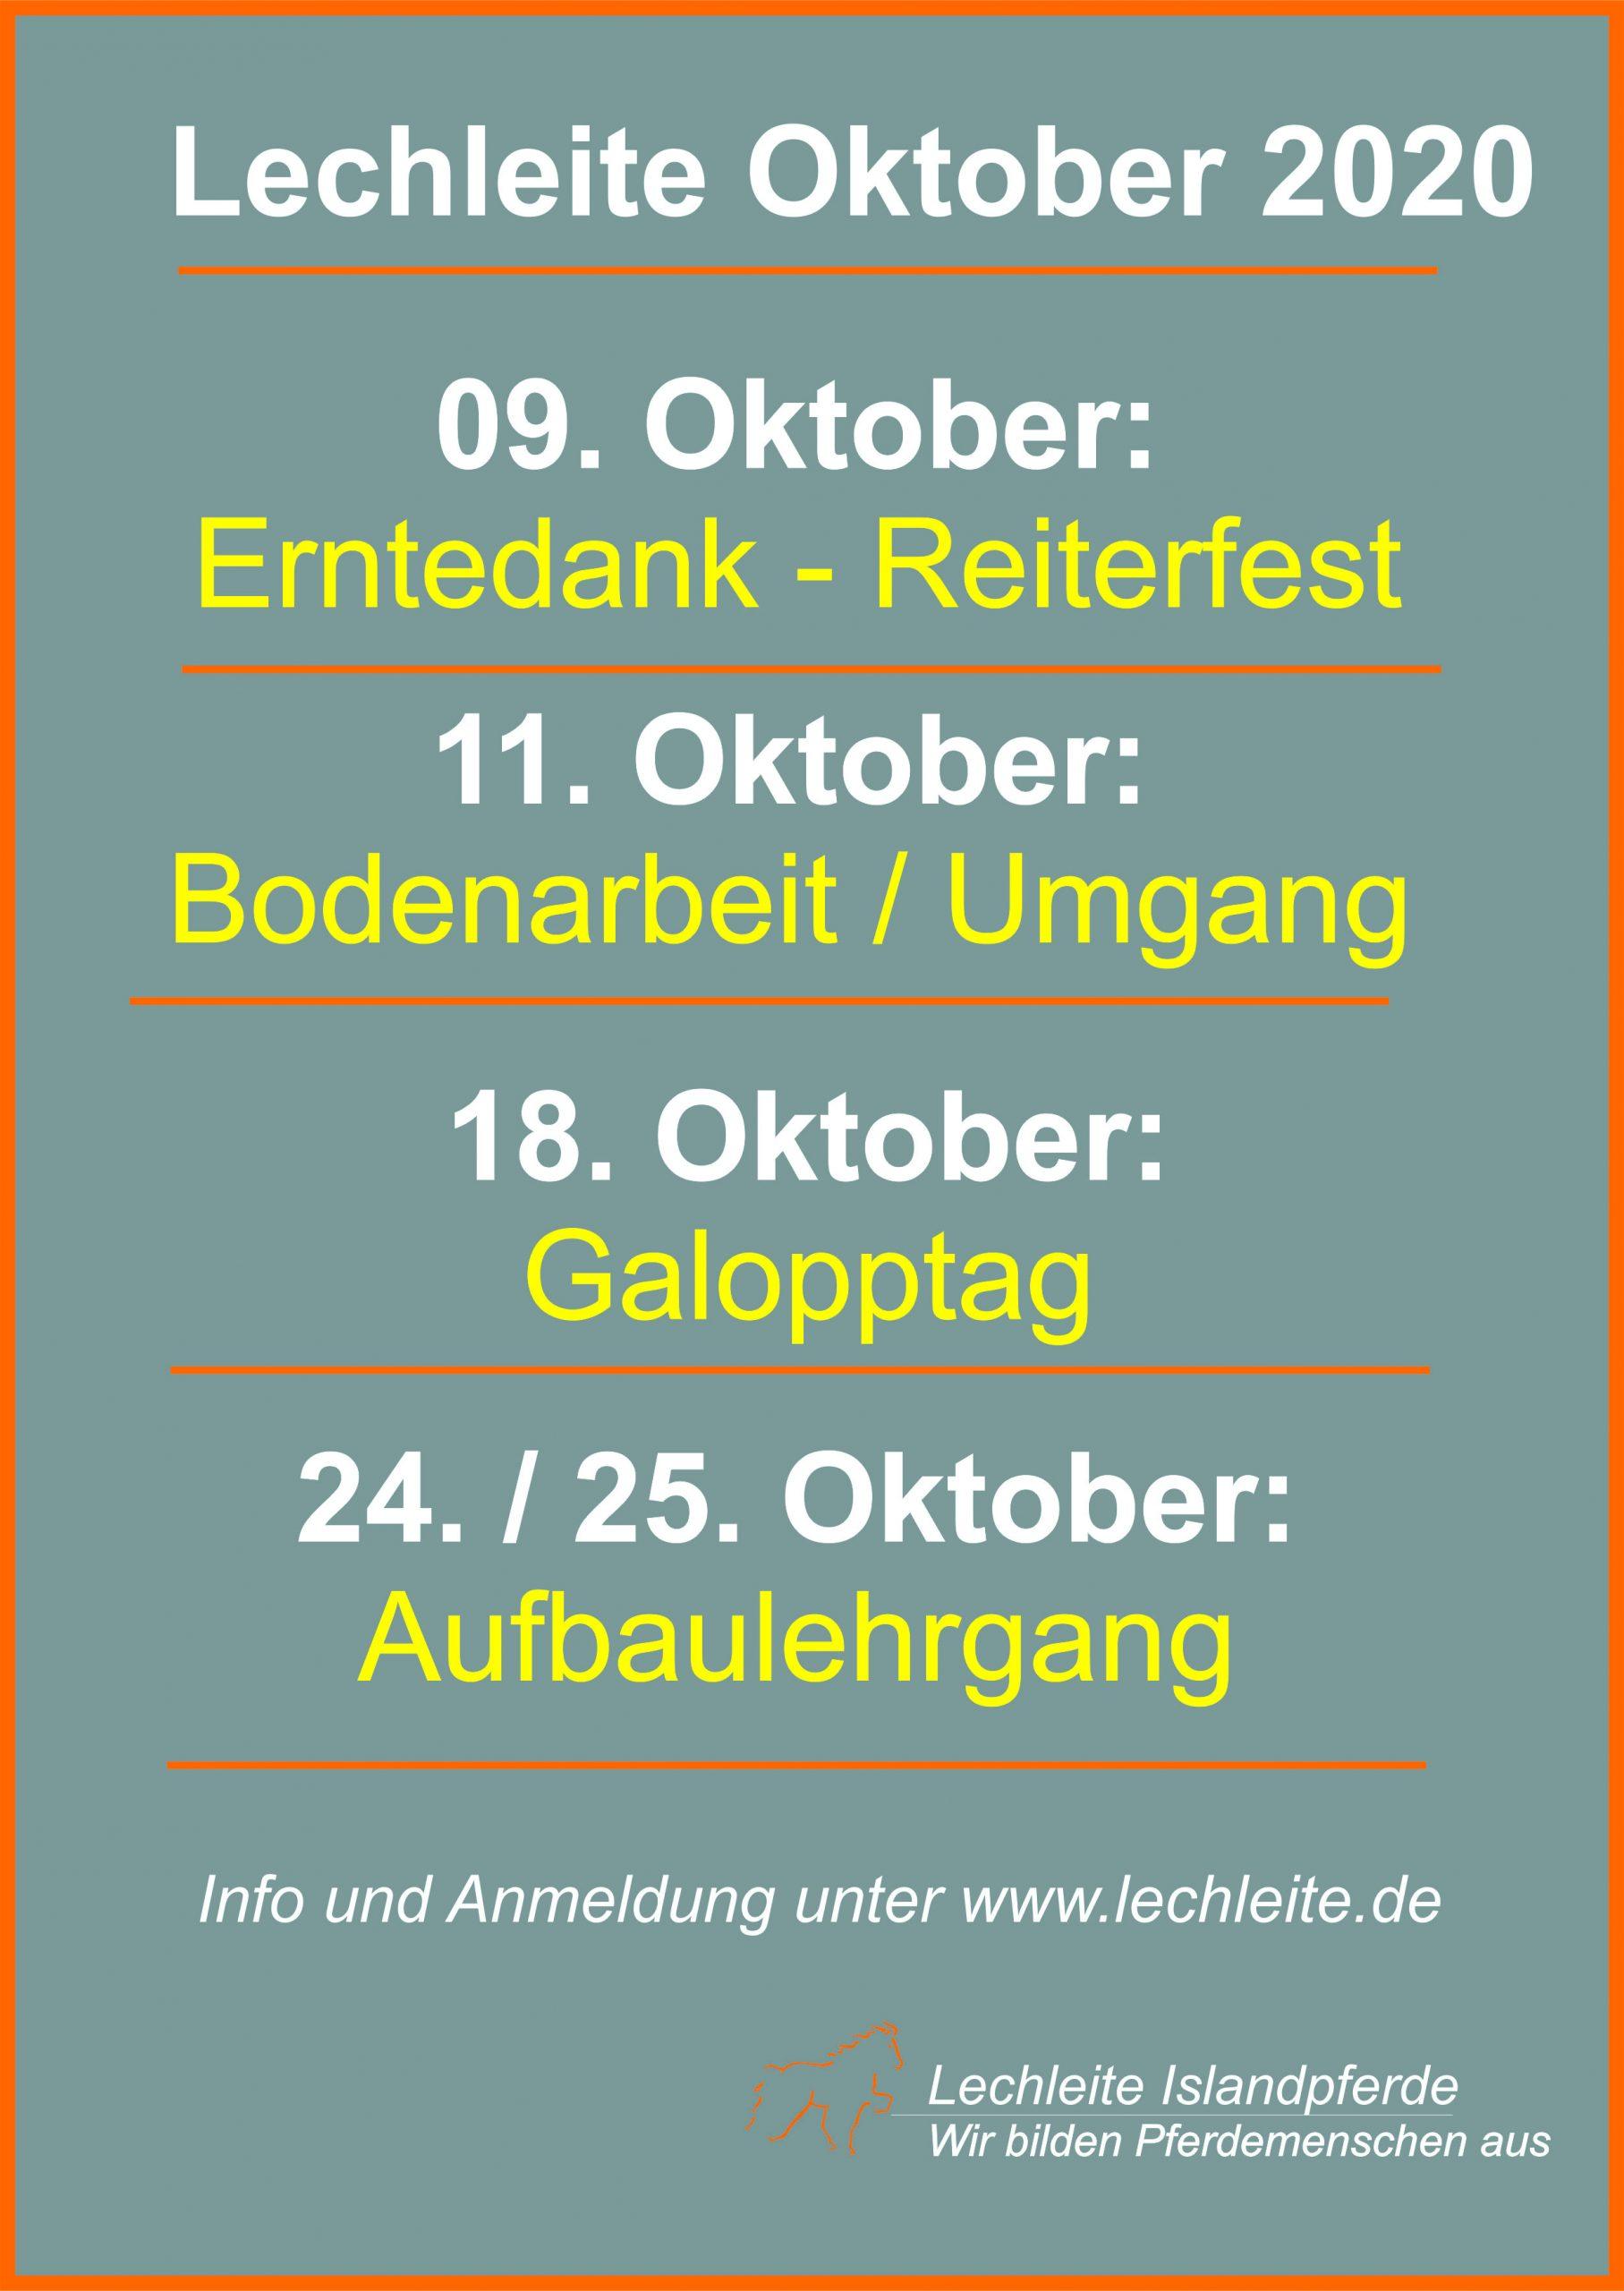 Lechleite im Oktober